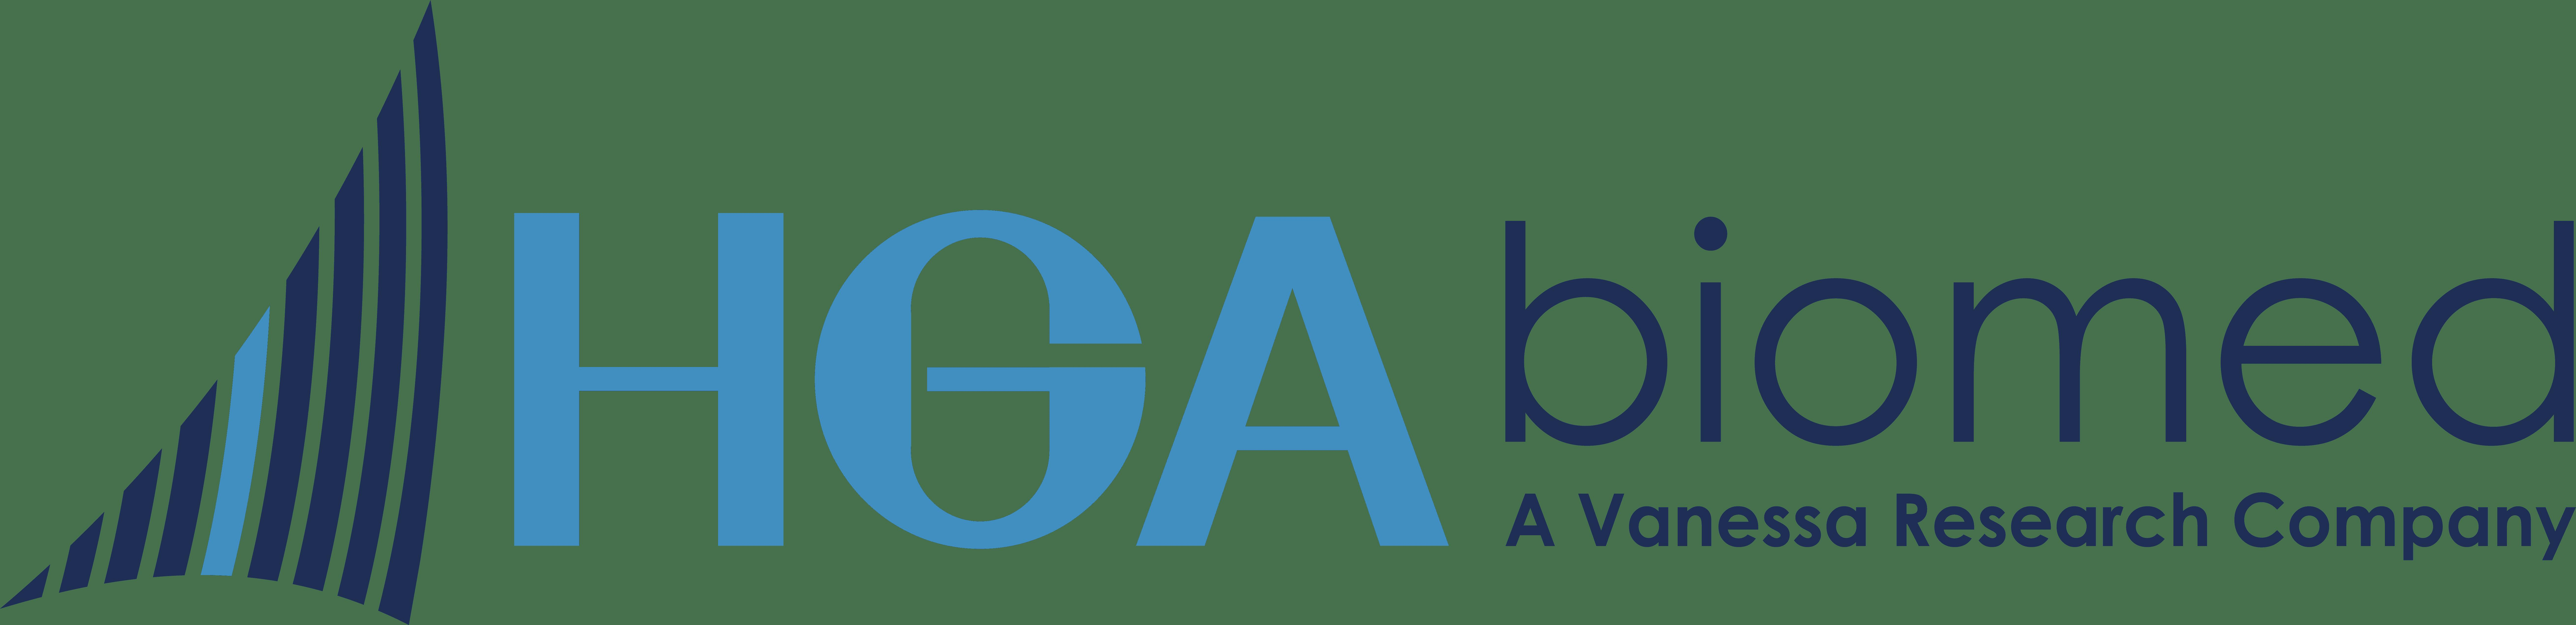 HGA Biomed Logo